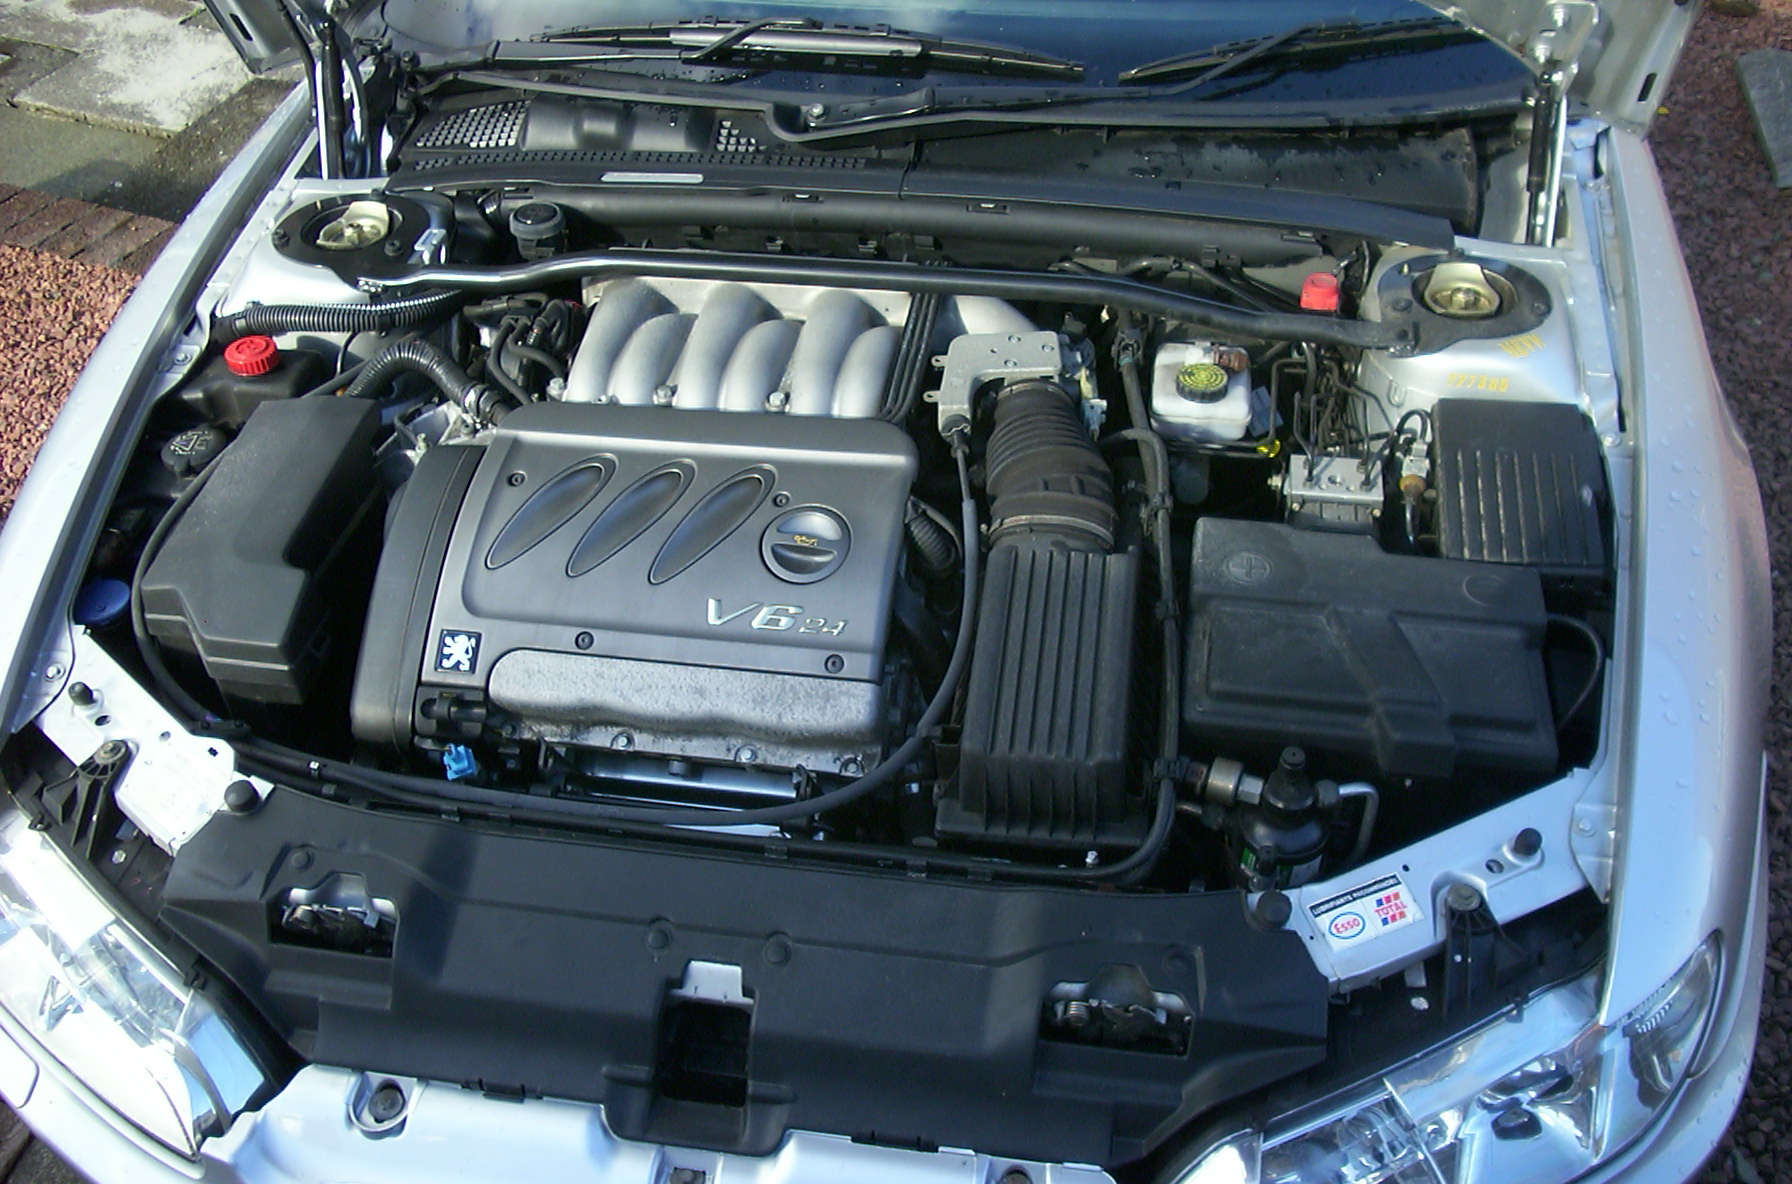 peugeot 406 coupe 8 3 0 v6 24v 190 hp rh autodata1 com peugeot 406 coupe 3.0 v6 manual Peugeot 3008